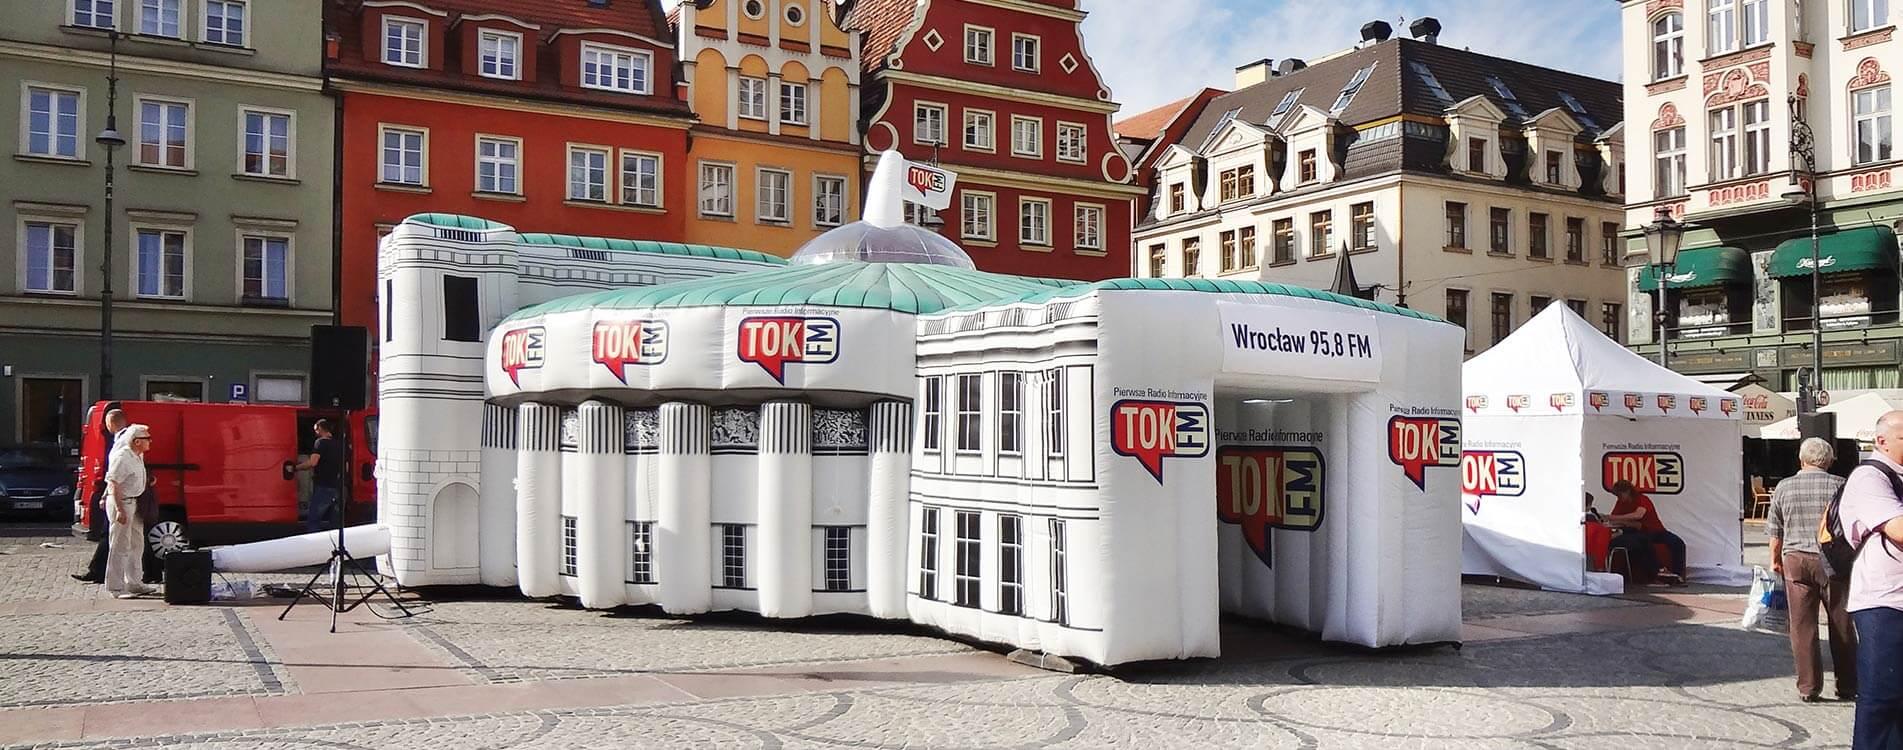 Clevair polski producent figur reklamowych